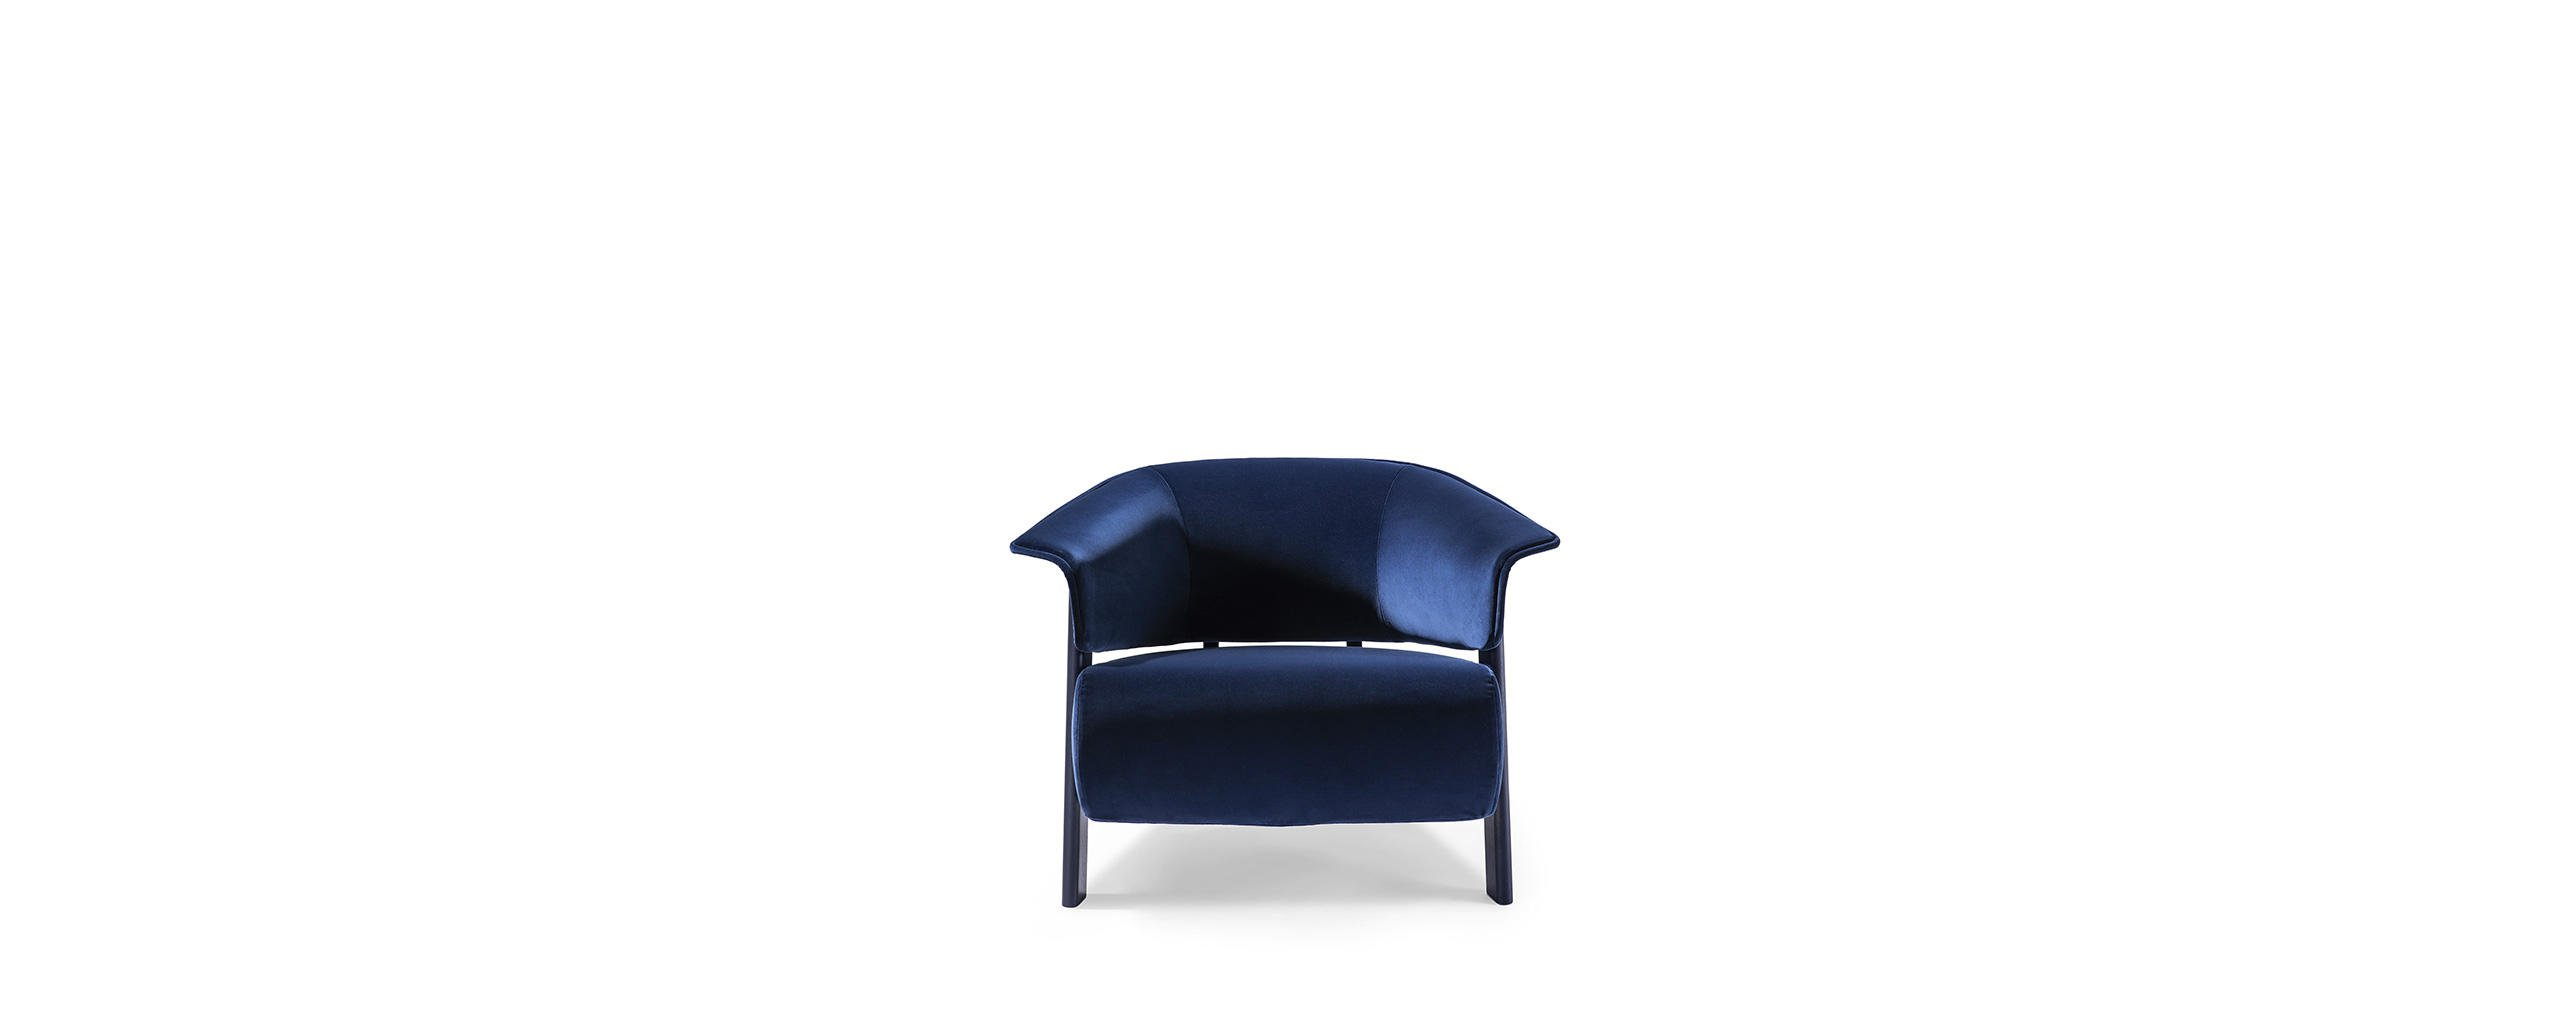 2_cassina_back-wing_armchair_patricia_urquiola_0